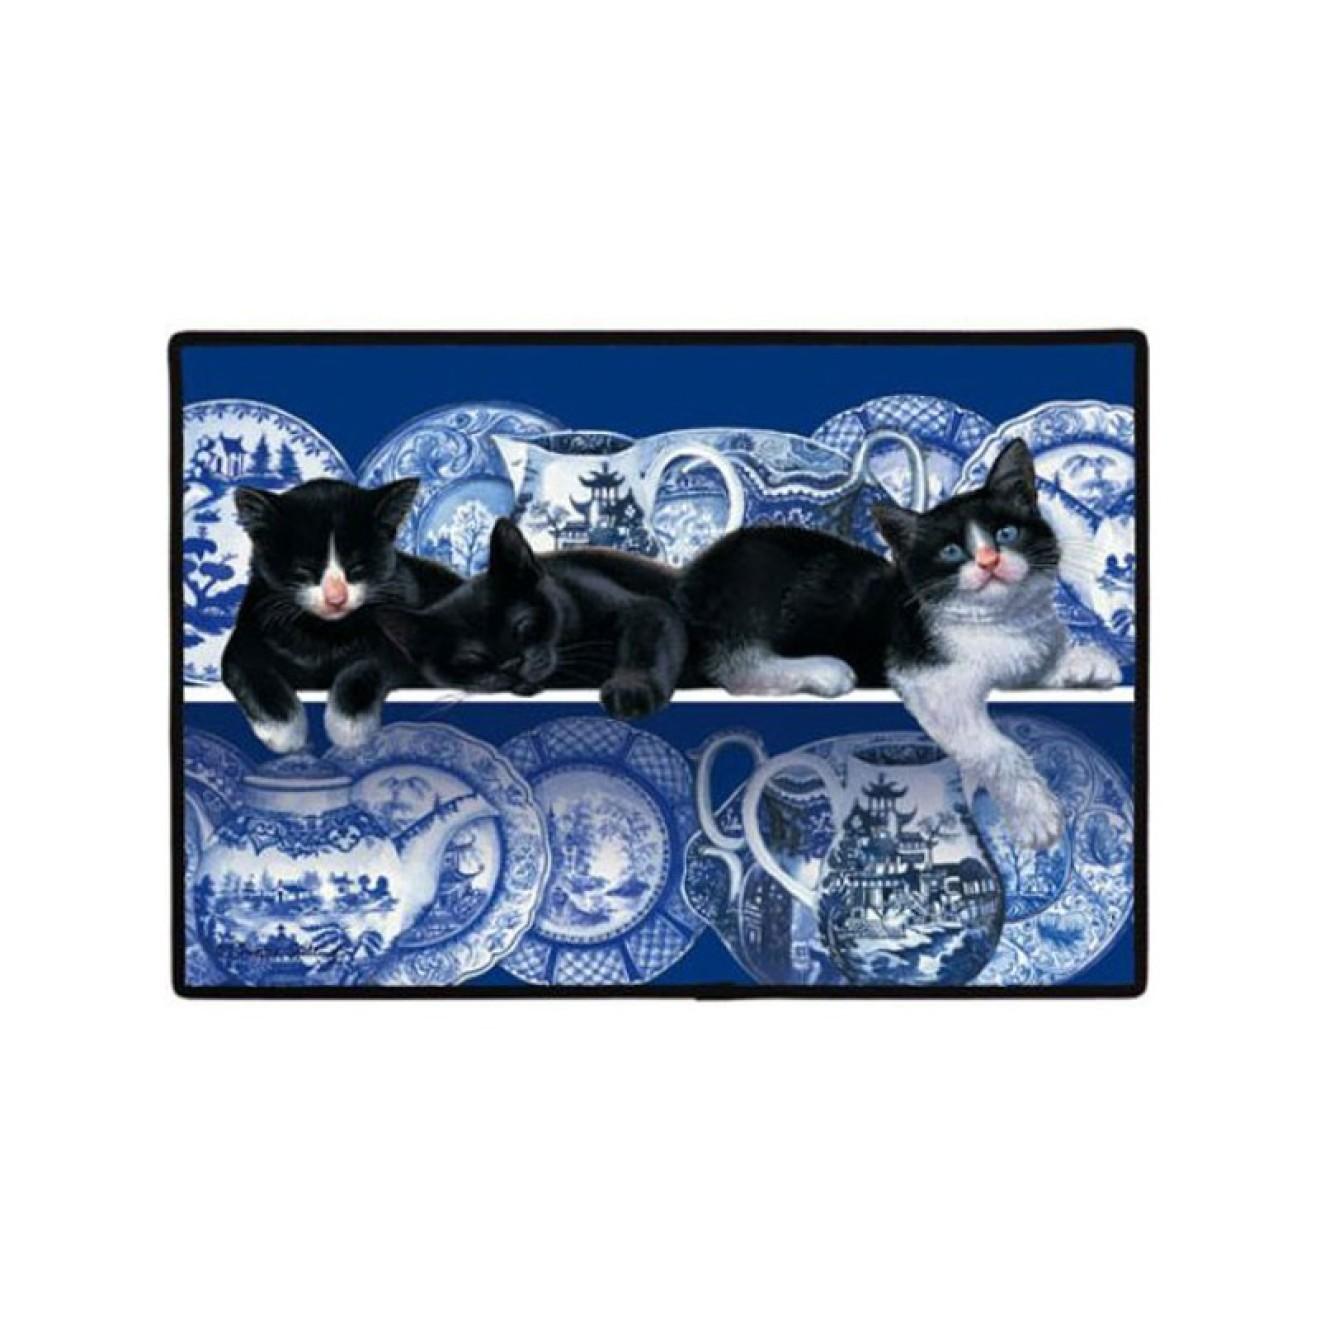 katzen fussmatte blaues design fussmatte katzenmotiv. Black Bedroom Furniture Sets. Home Design Ideas